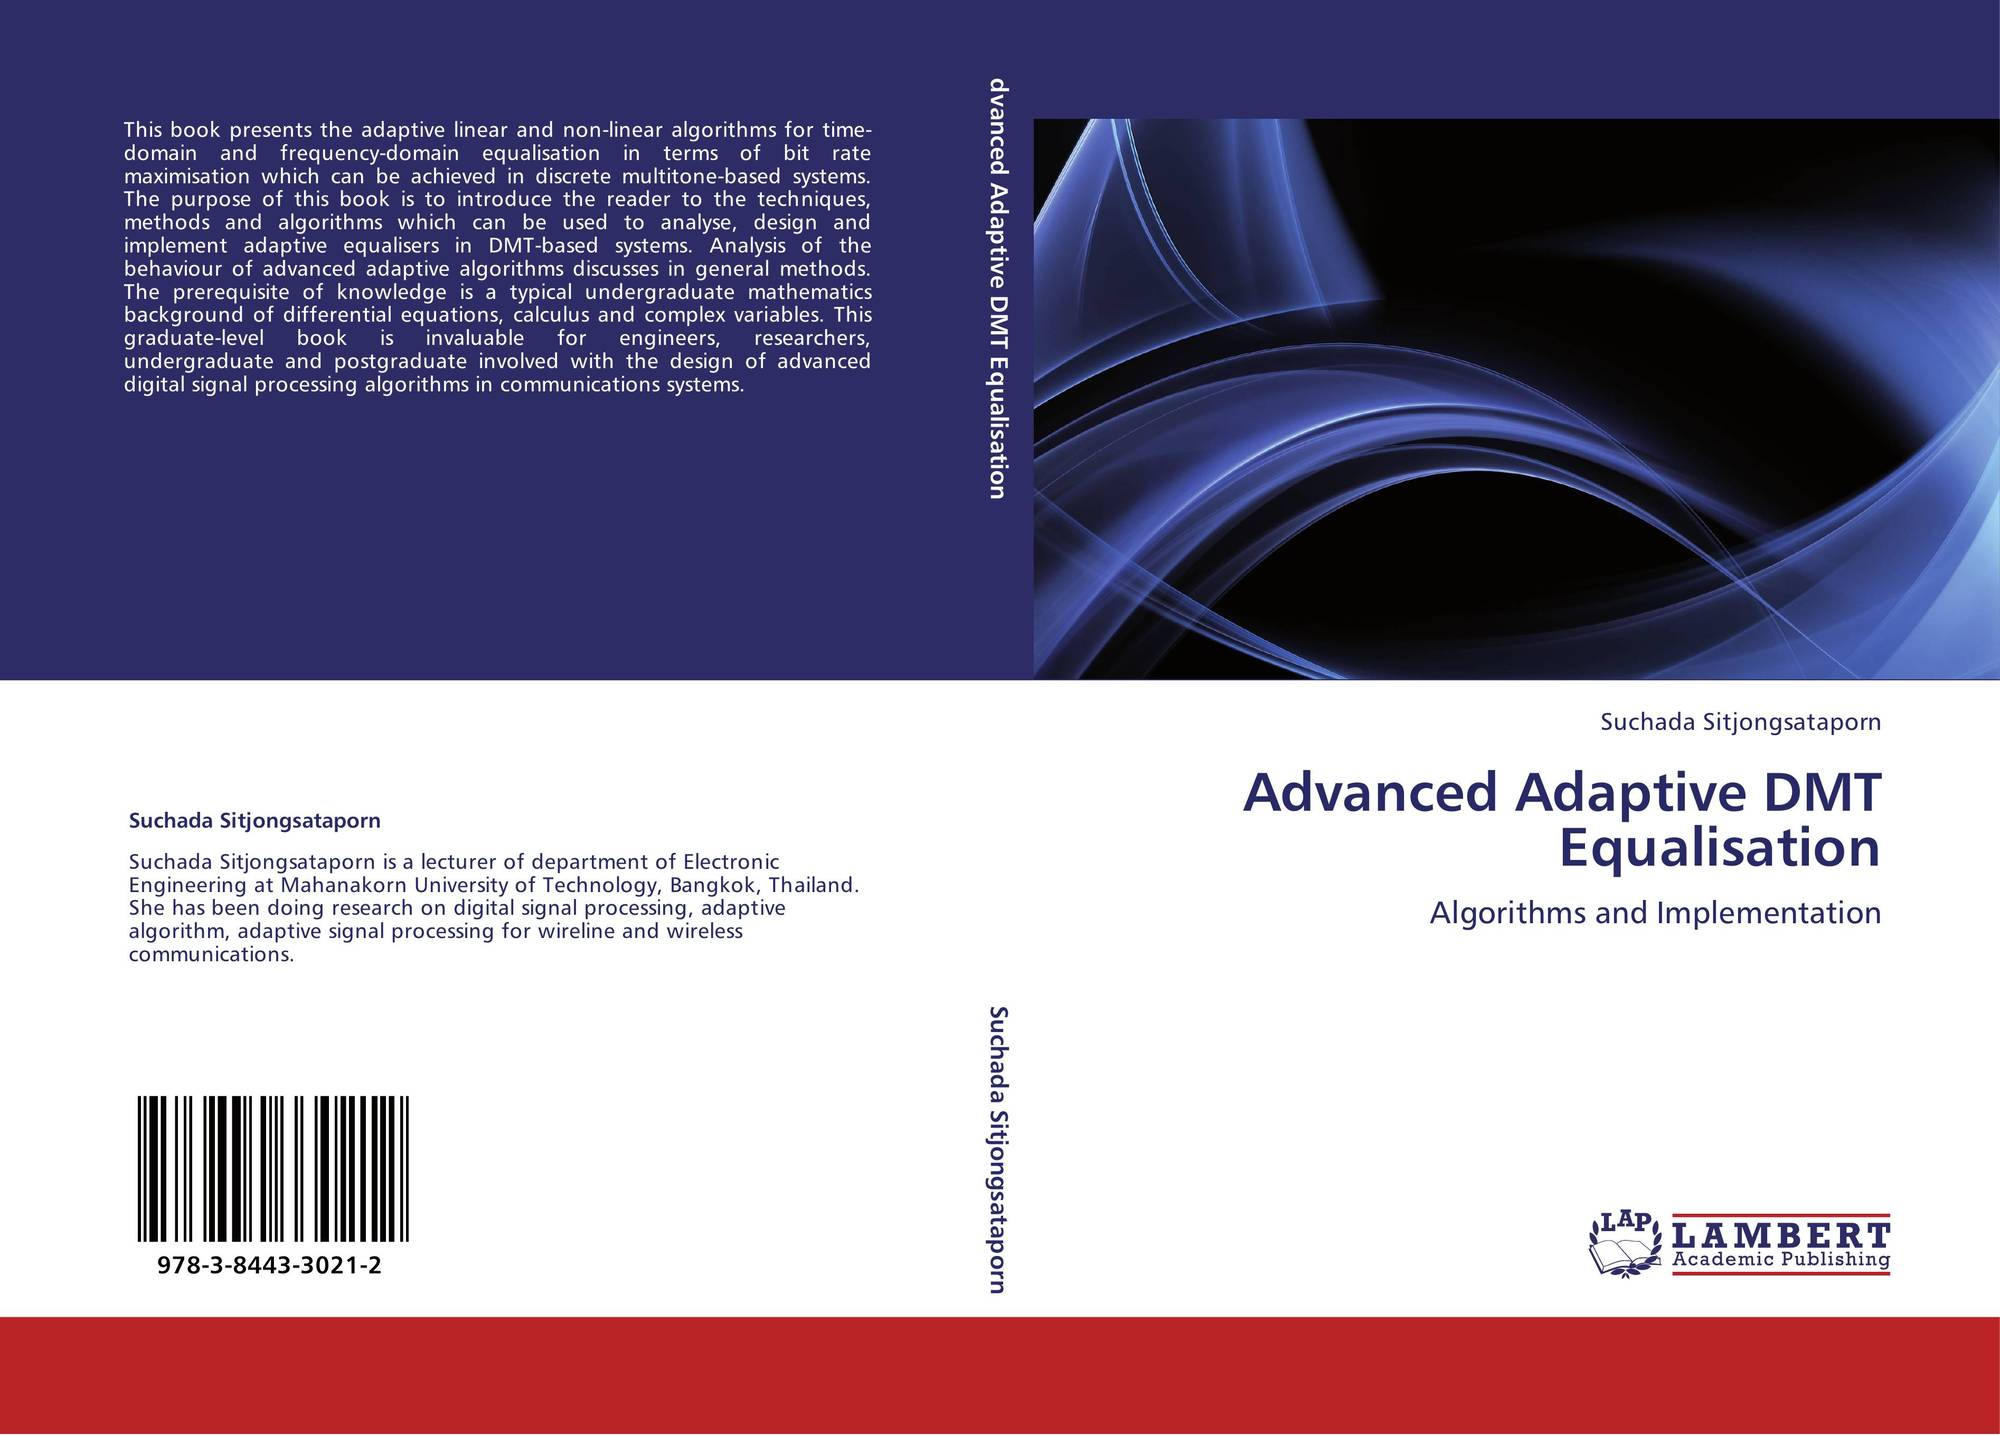 Advanced Adaptive DMT Equalisation, 978-3-8443-3021-2